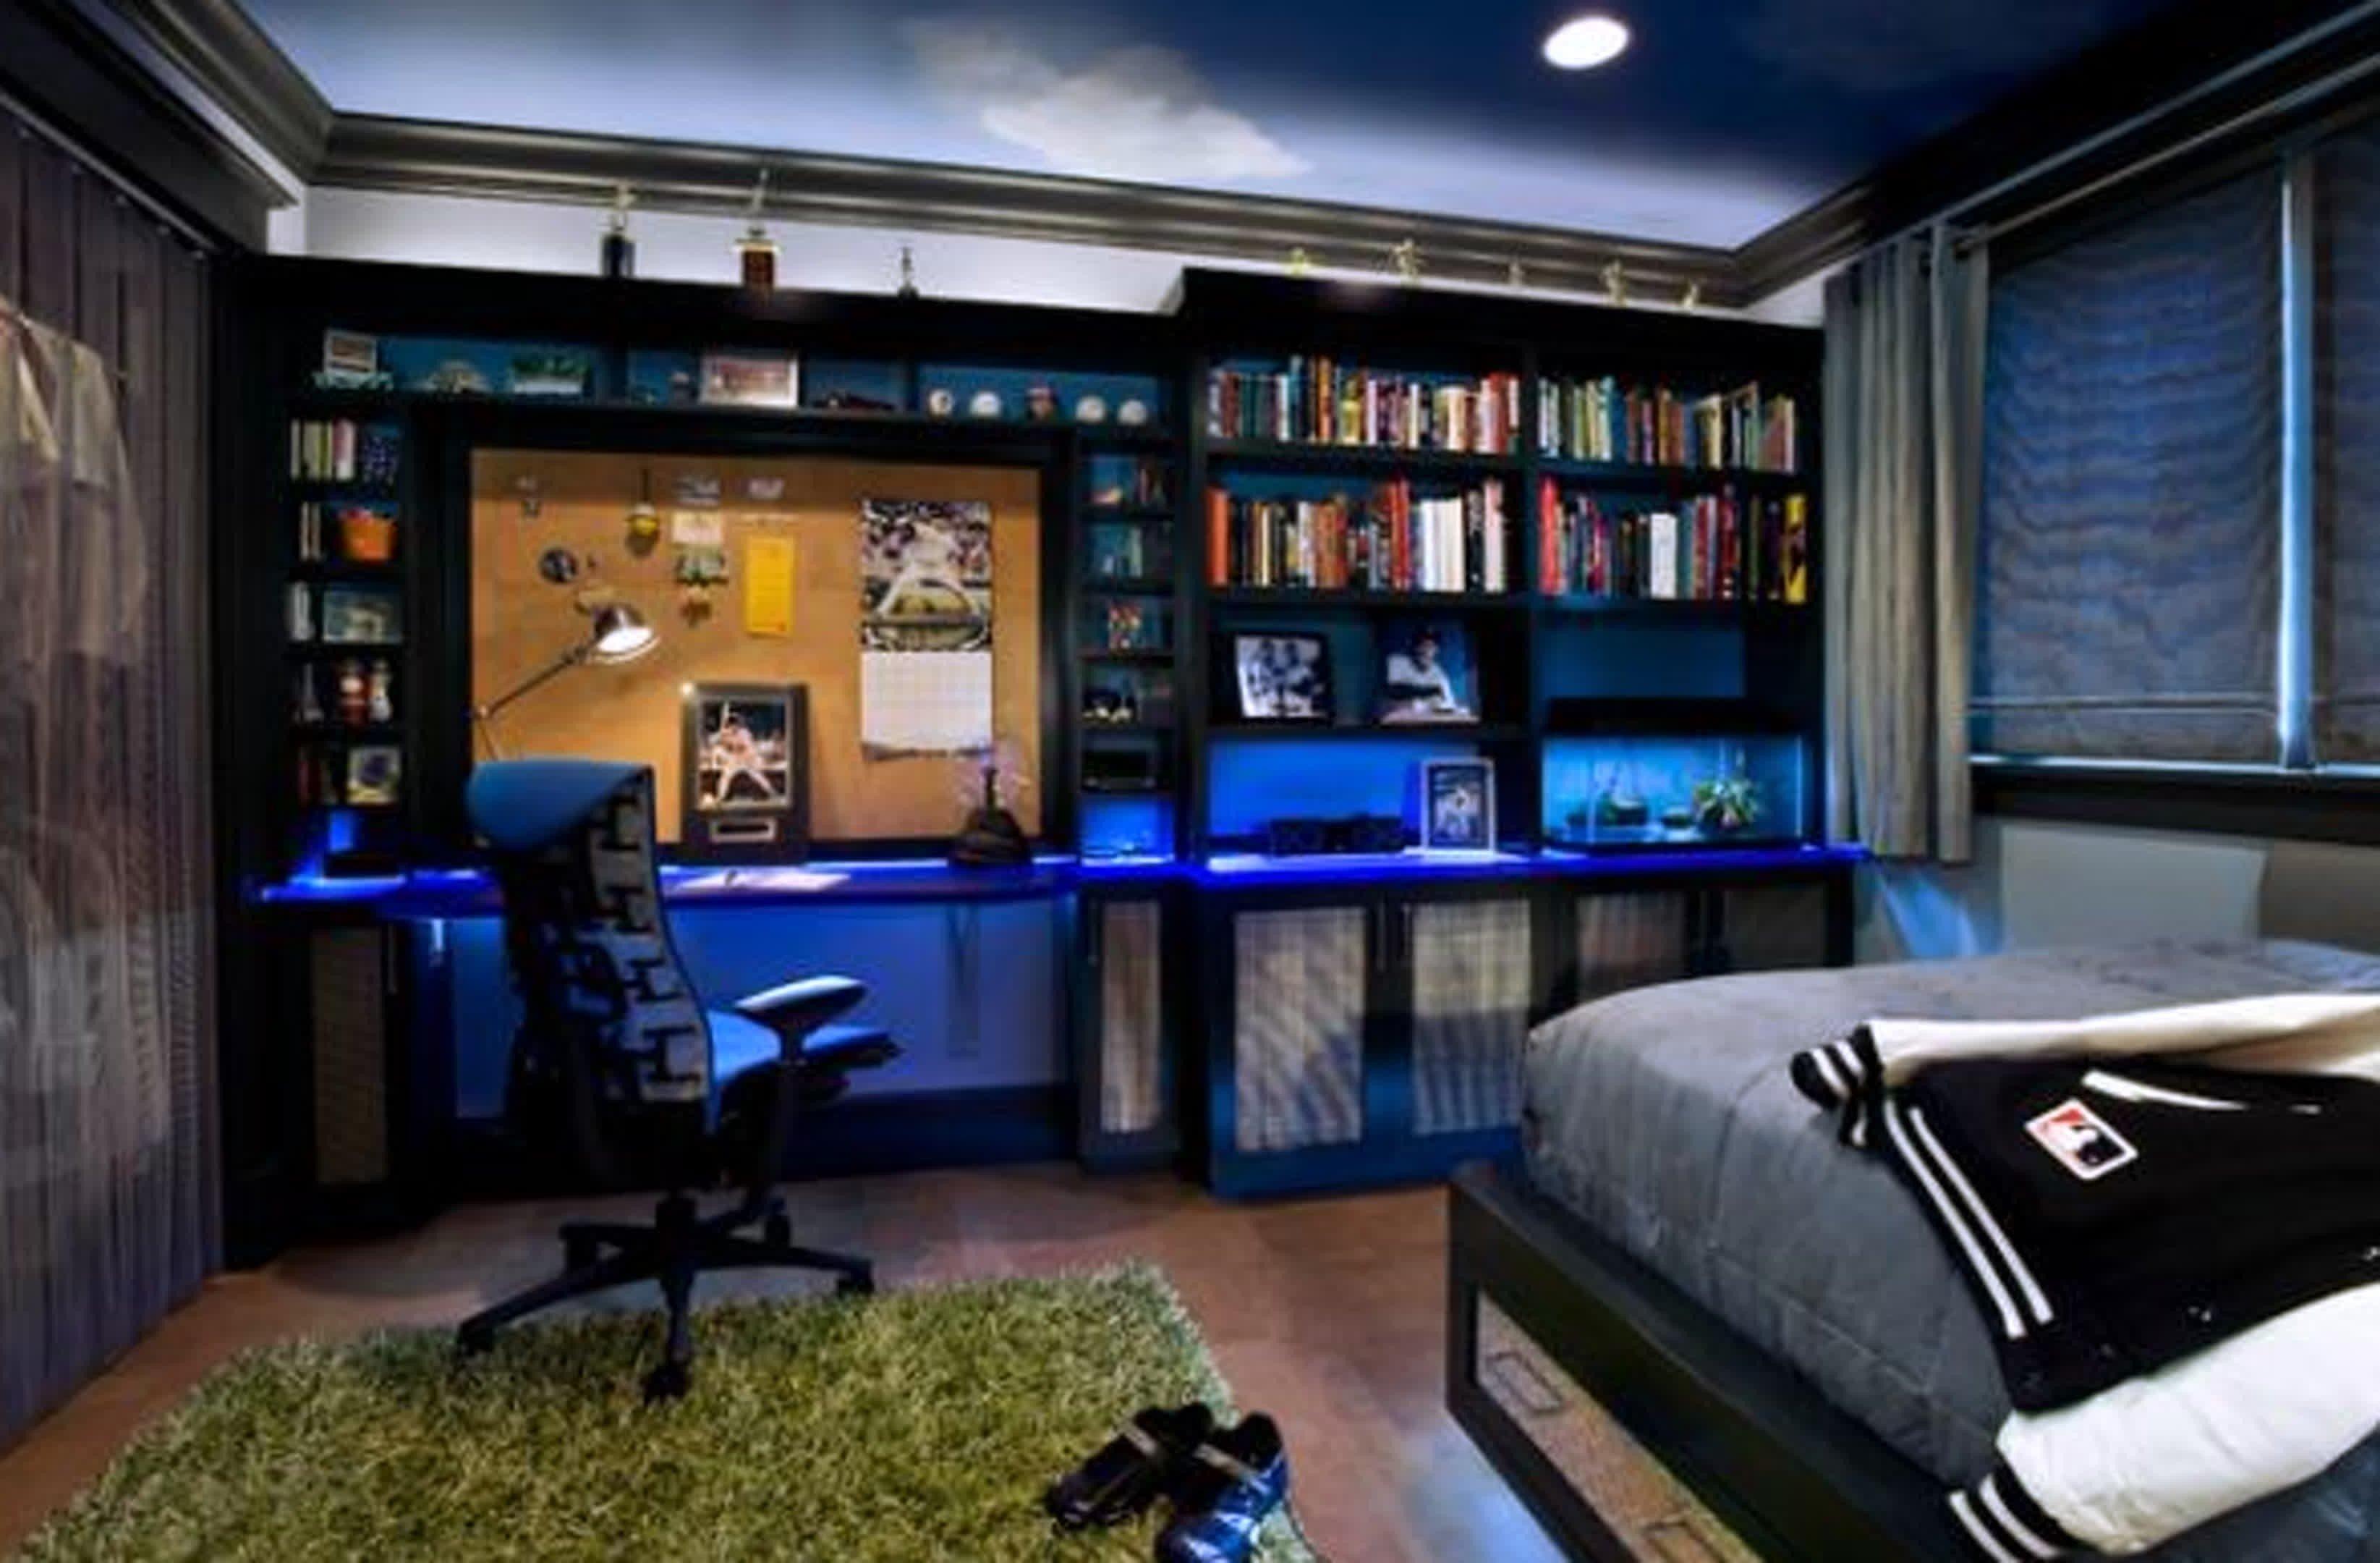 10 Beautiful Cool Room Ideas For Teenage Guys teenage male bedroom decorating ideas new bedroom attractive cool 2020